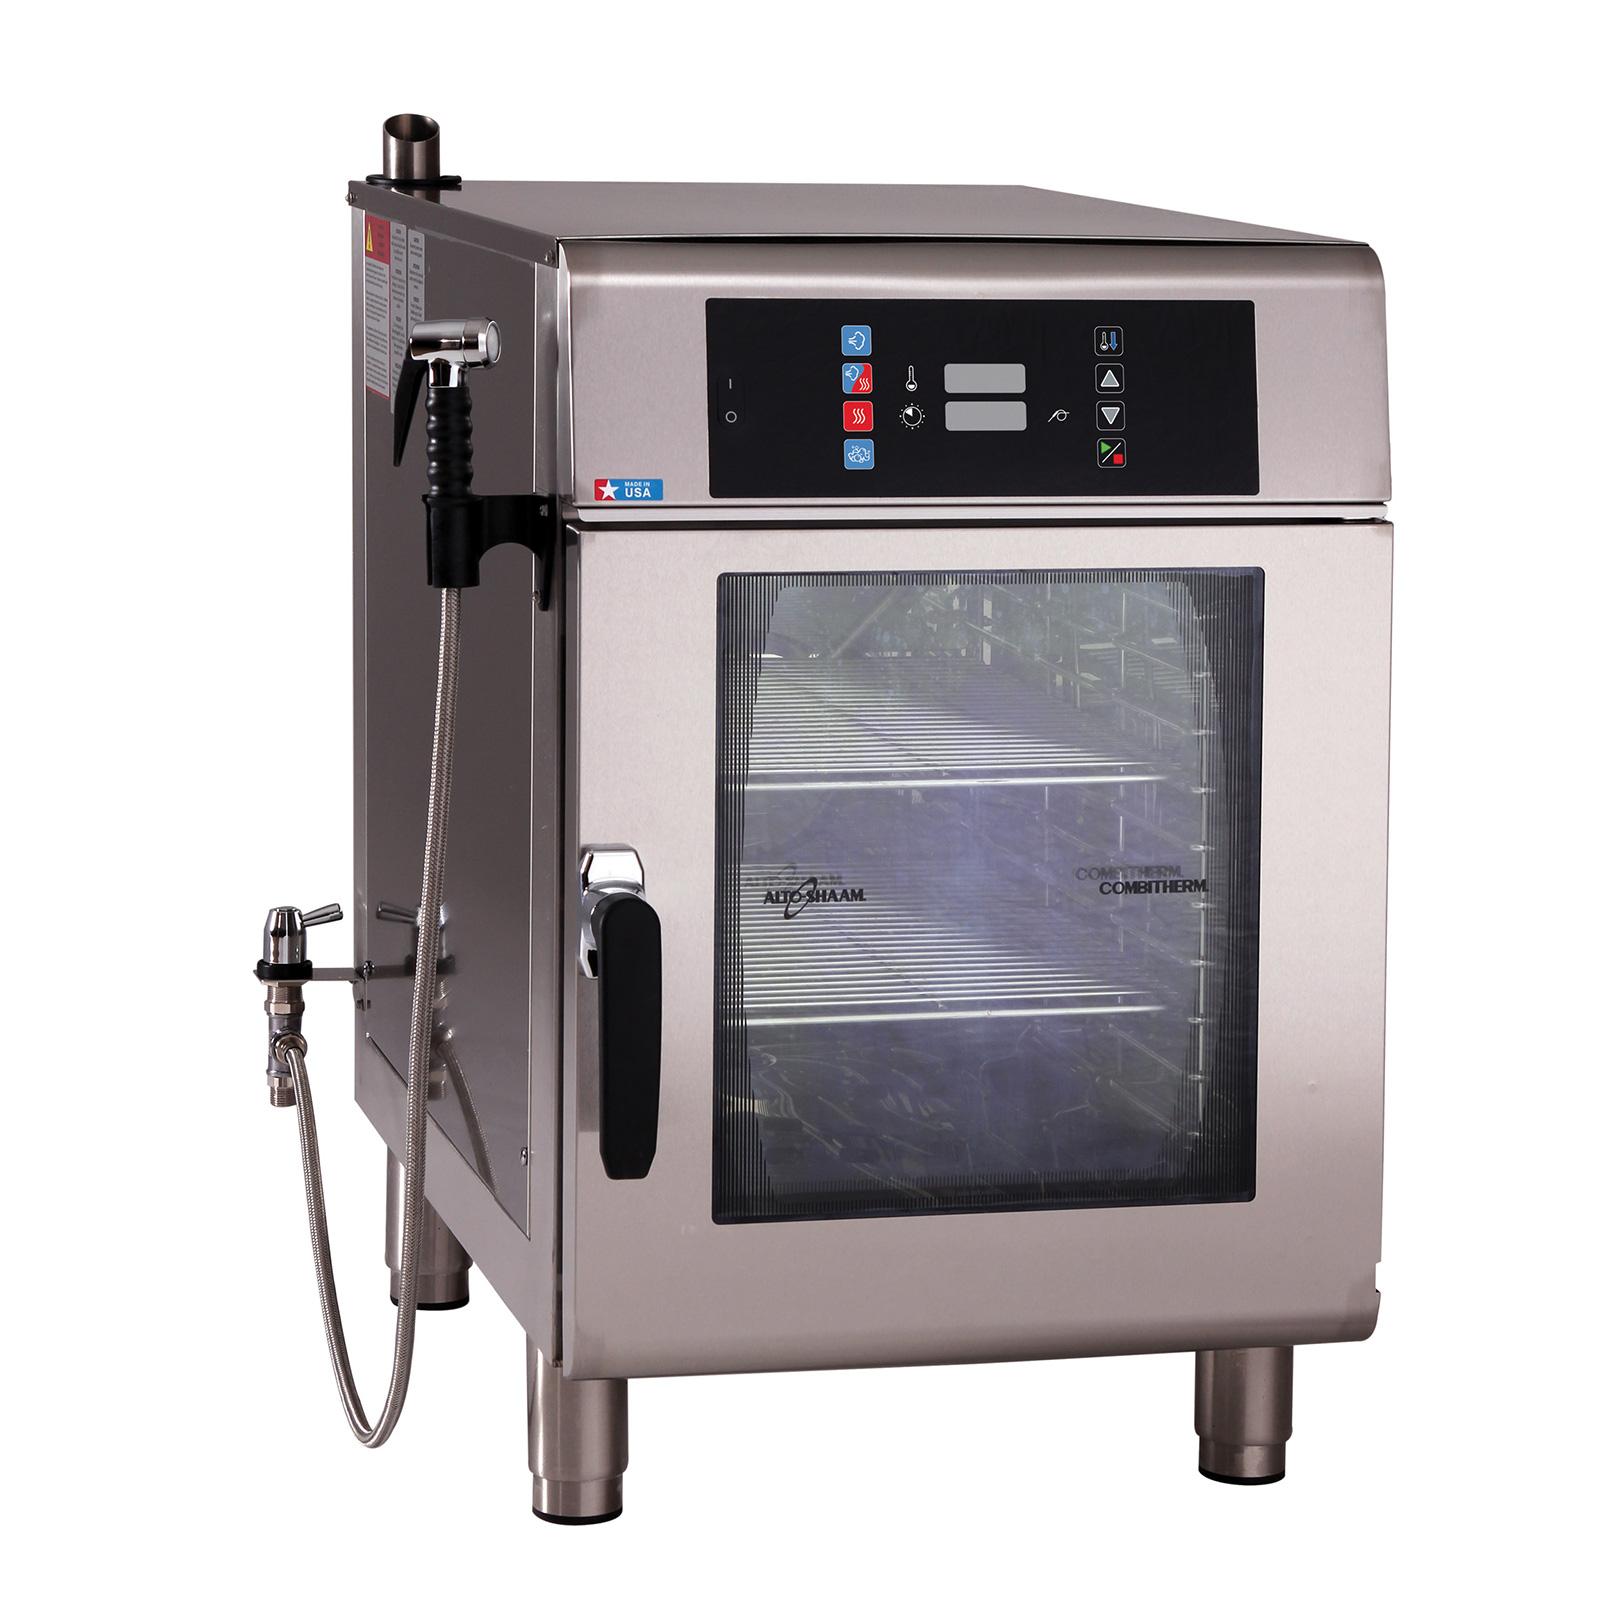 Alto-Shaam CTX4-10E/S combi oven, electric